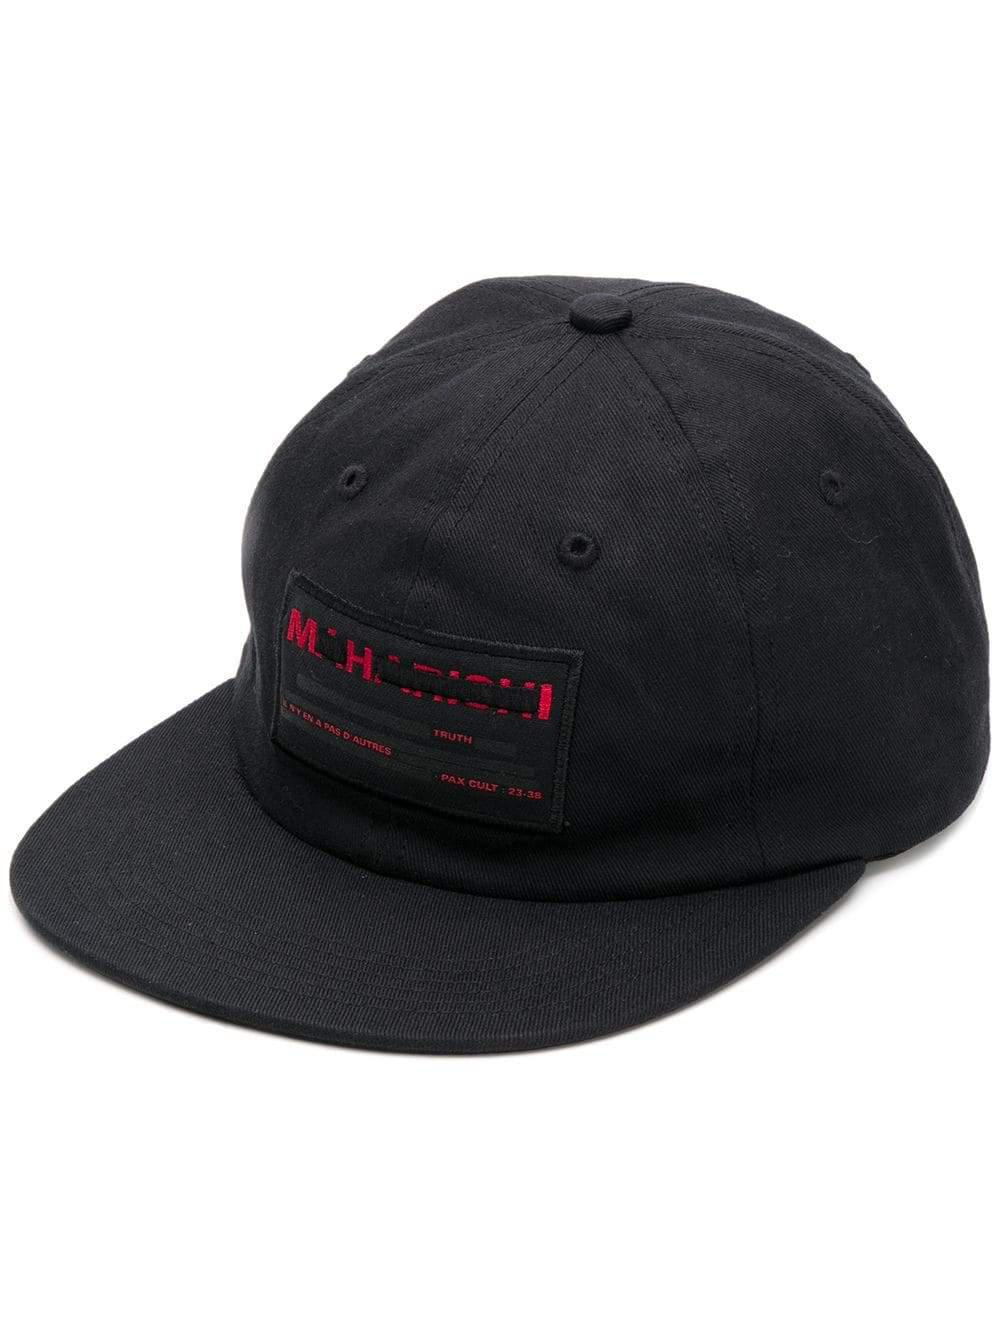 6aa6fc74f4a Lyst - Maharishi Logo Patch Baseball Cap in Black for Men - Save 40%